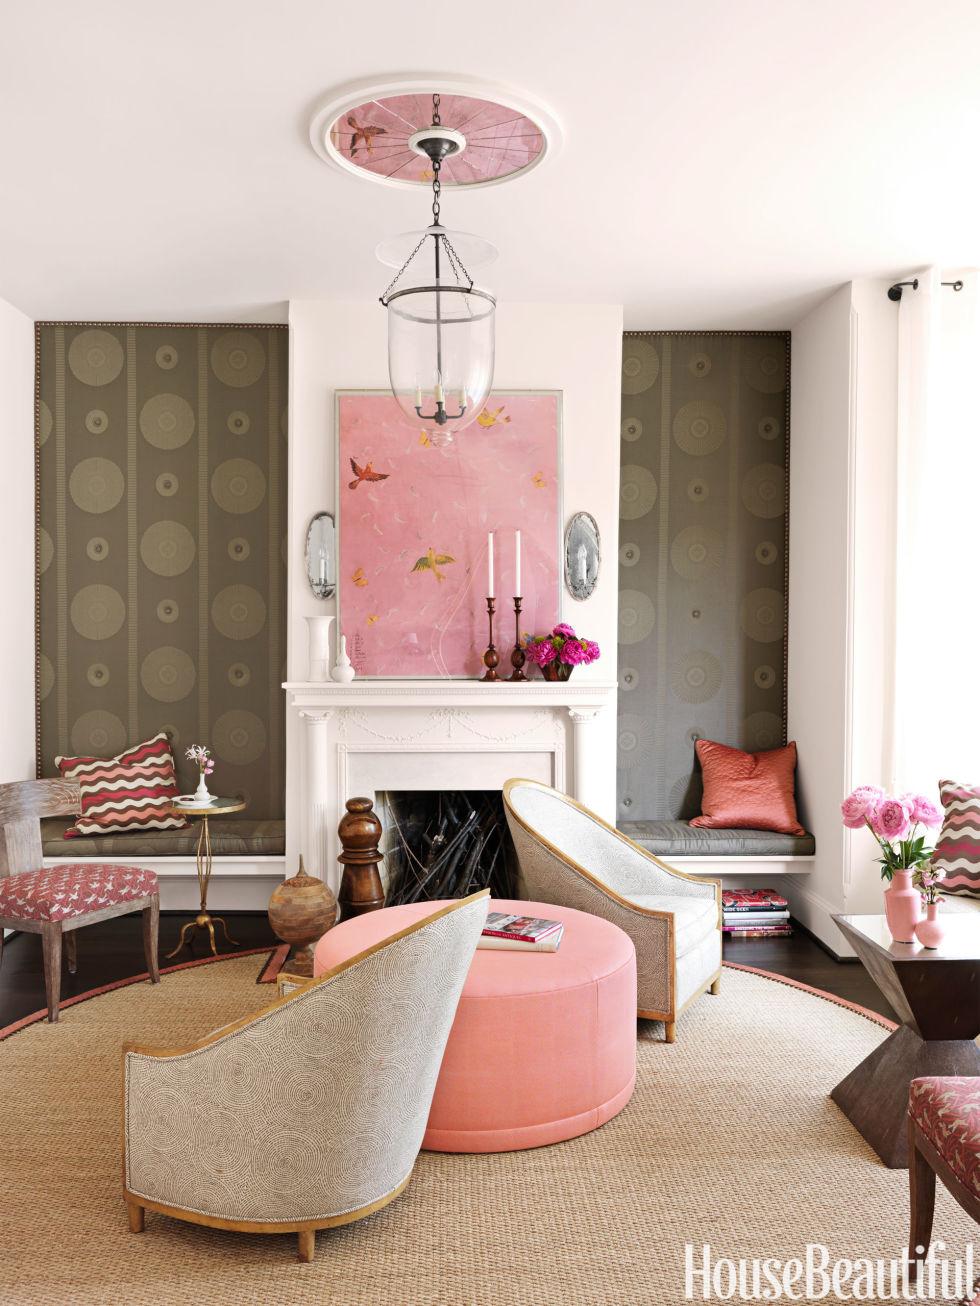 color decorating ideas - colorful interior design